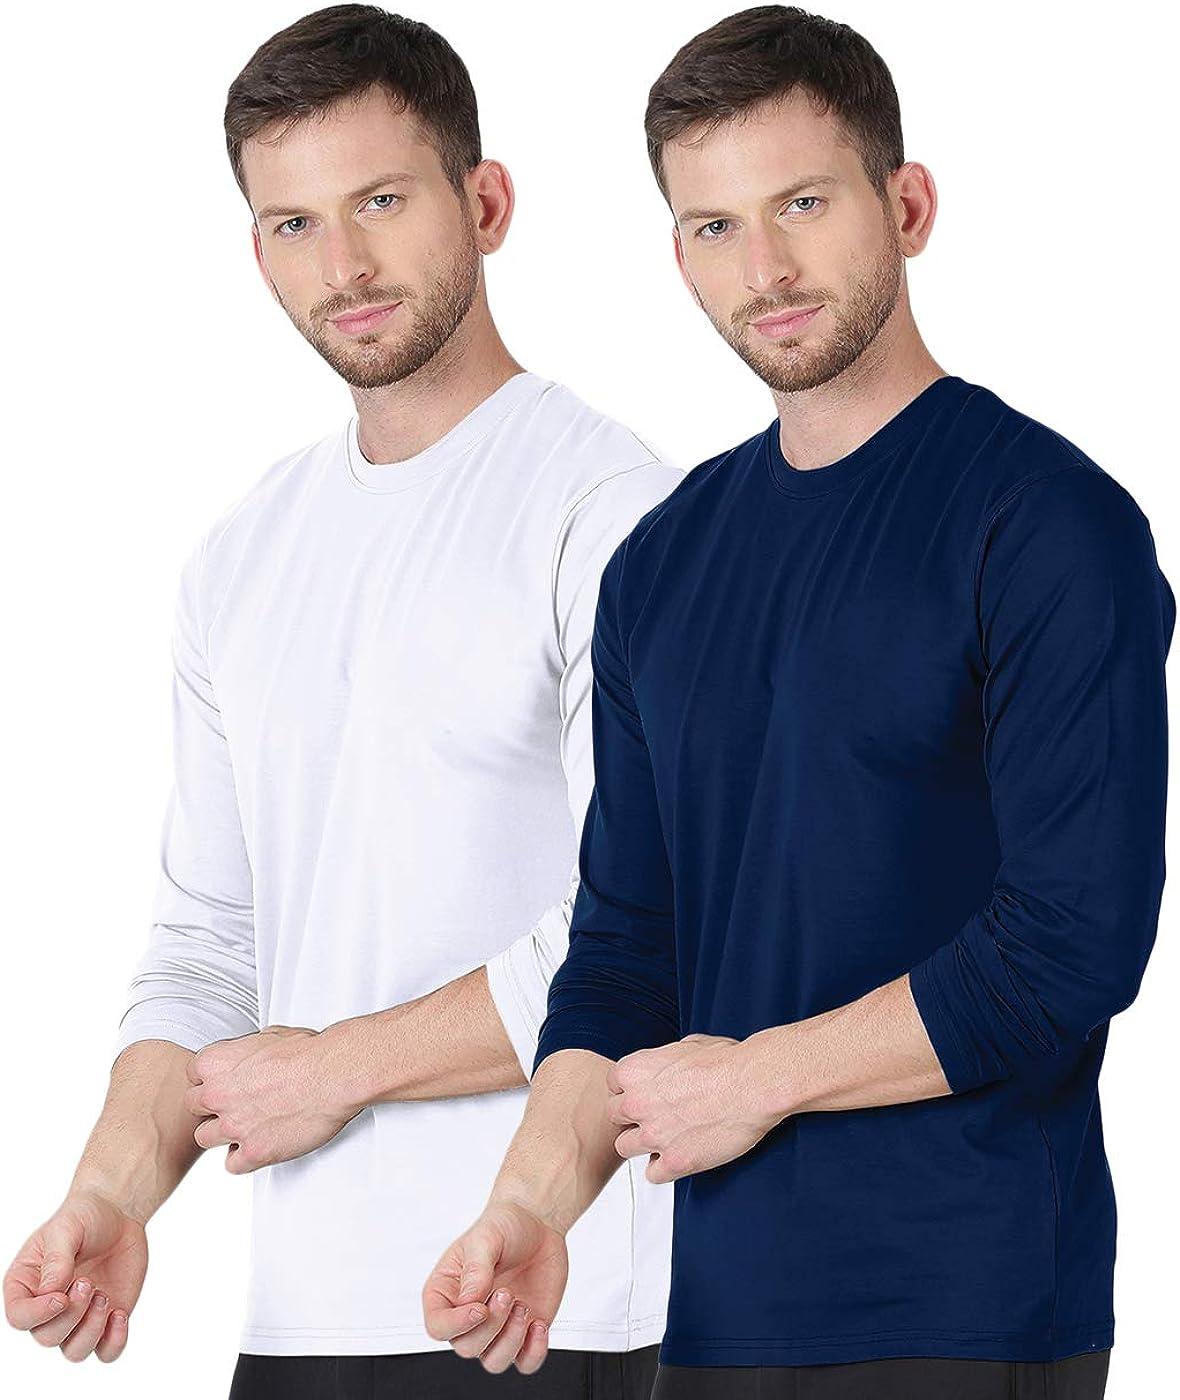 Babu Fashion Cotton Regular Full Sleeves T-Shirt for Men,t shirt for mens india, t shirt for men online, polo t shirts, sport t shirt, black t shirt, blue t shirt, white t shirt,Amazon,